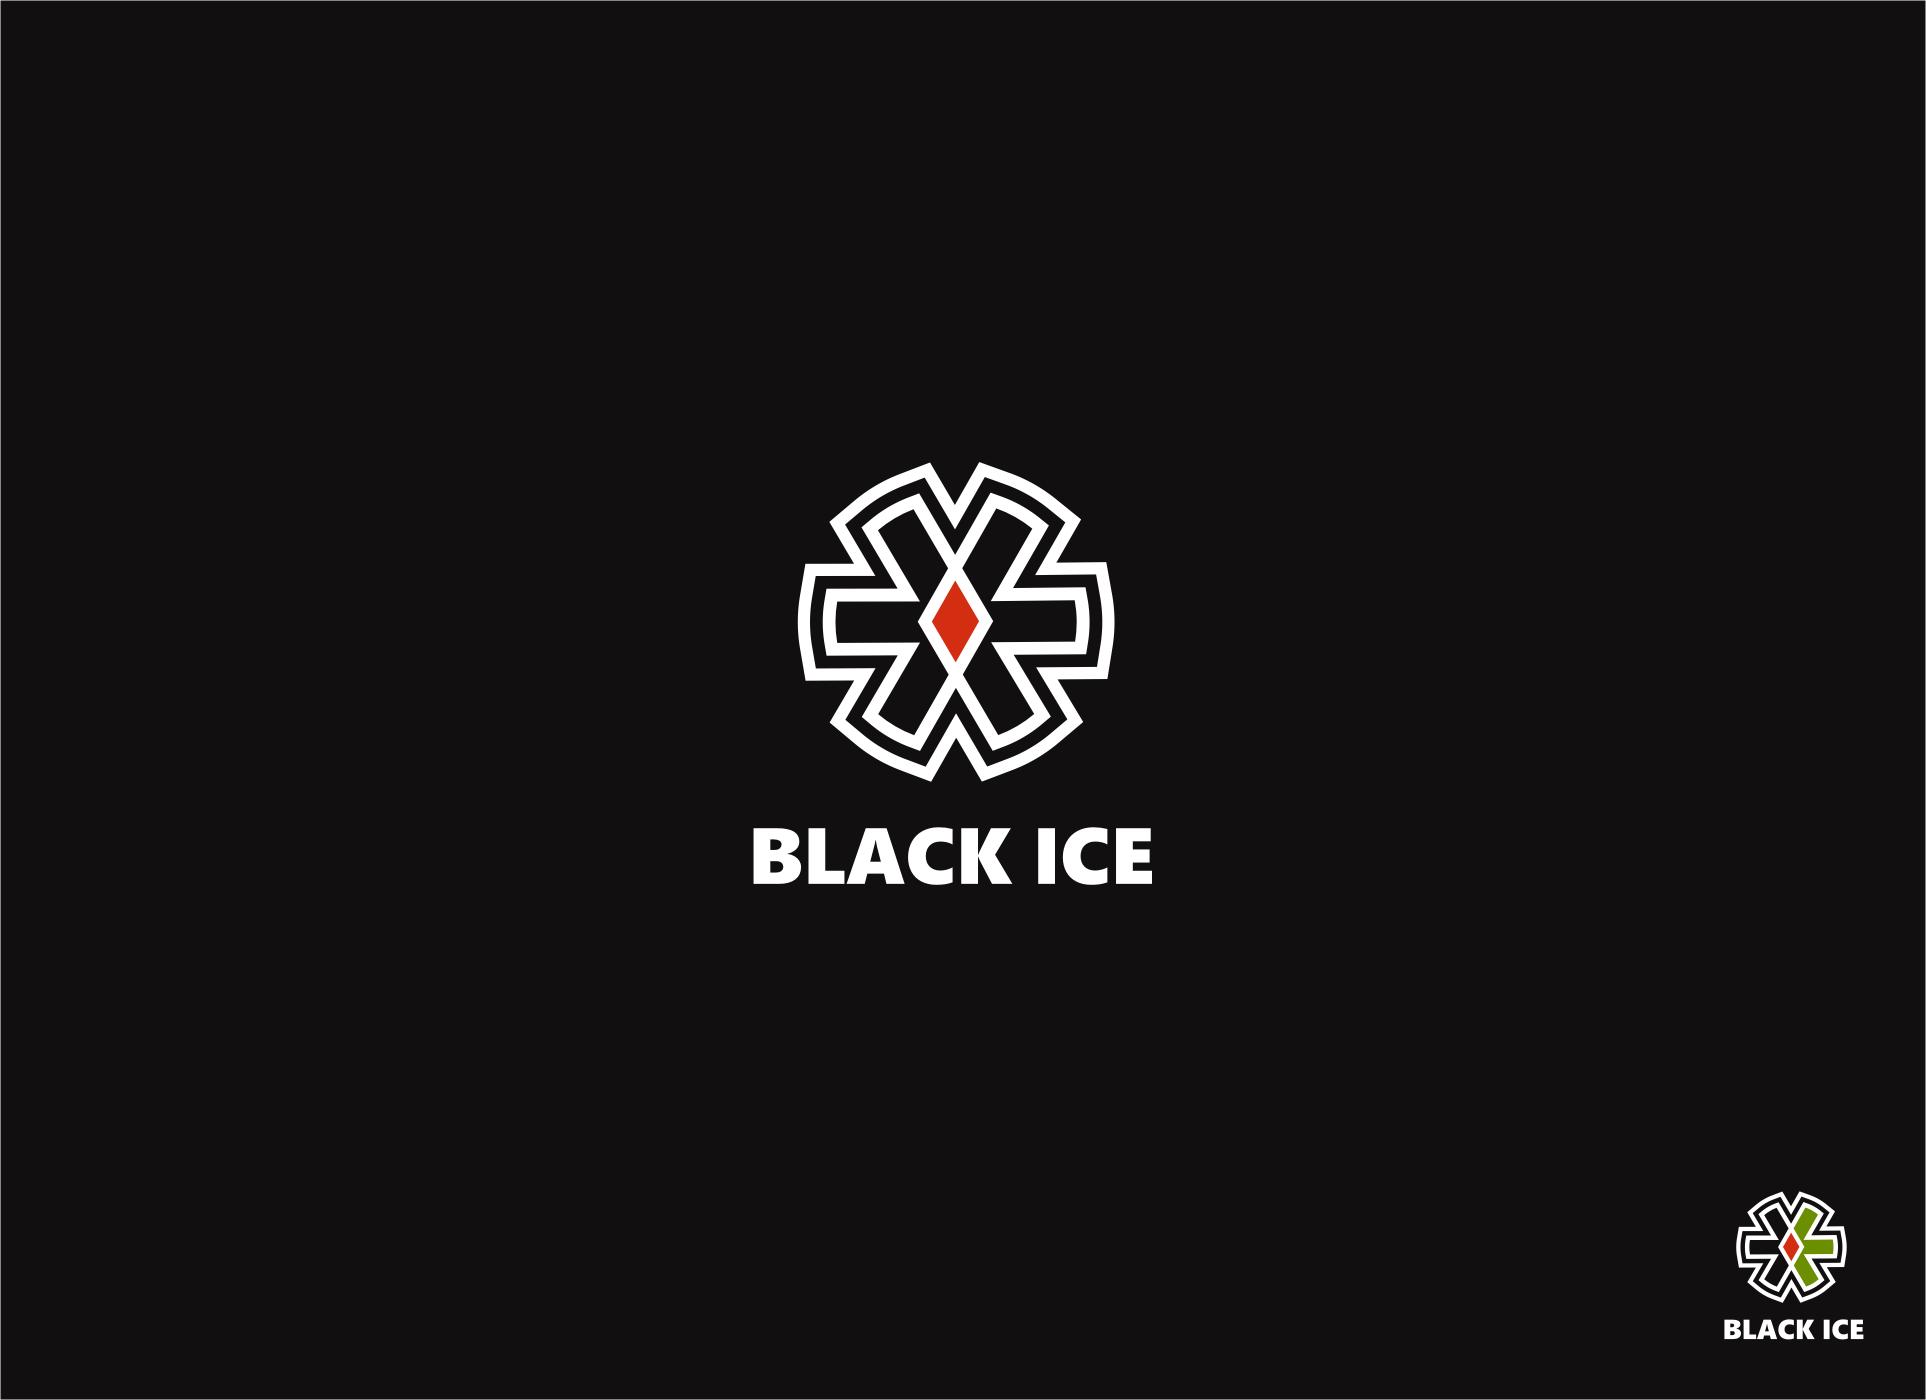 "Логотип + Фирменный стиль для компании ""BLACK ICE"" фото f_97657149144e4bb8.png"